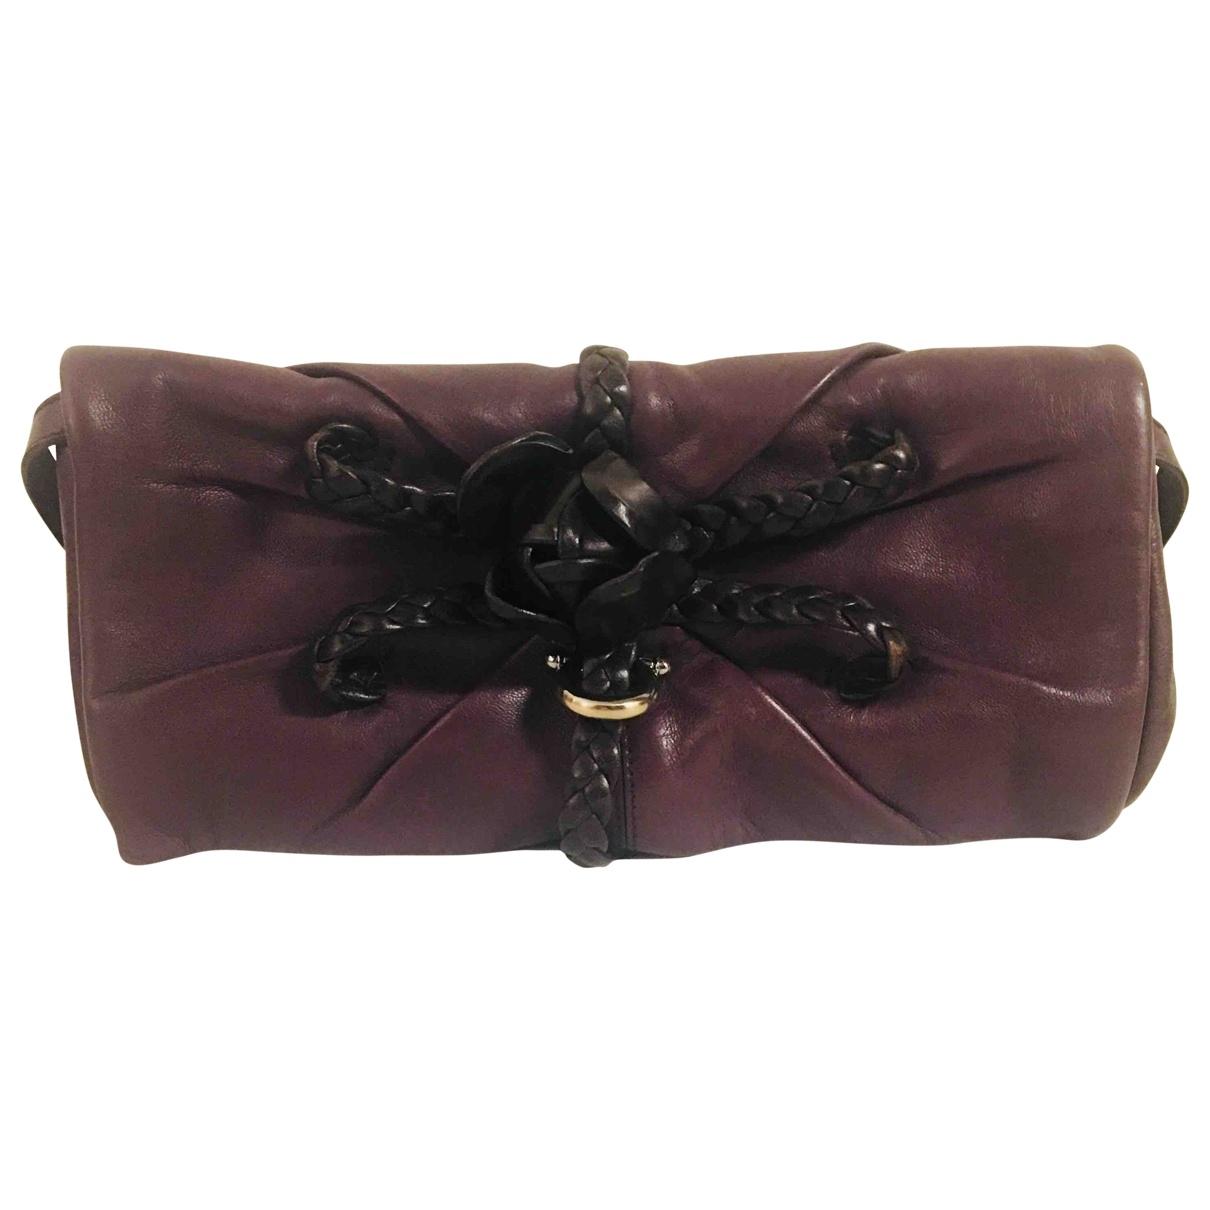 Salvatore Ferragamo \N Purple Leather Clutch bag for Women \N